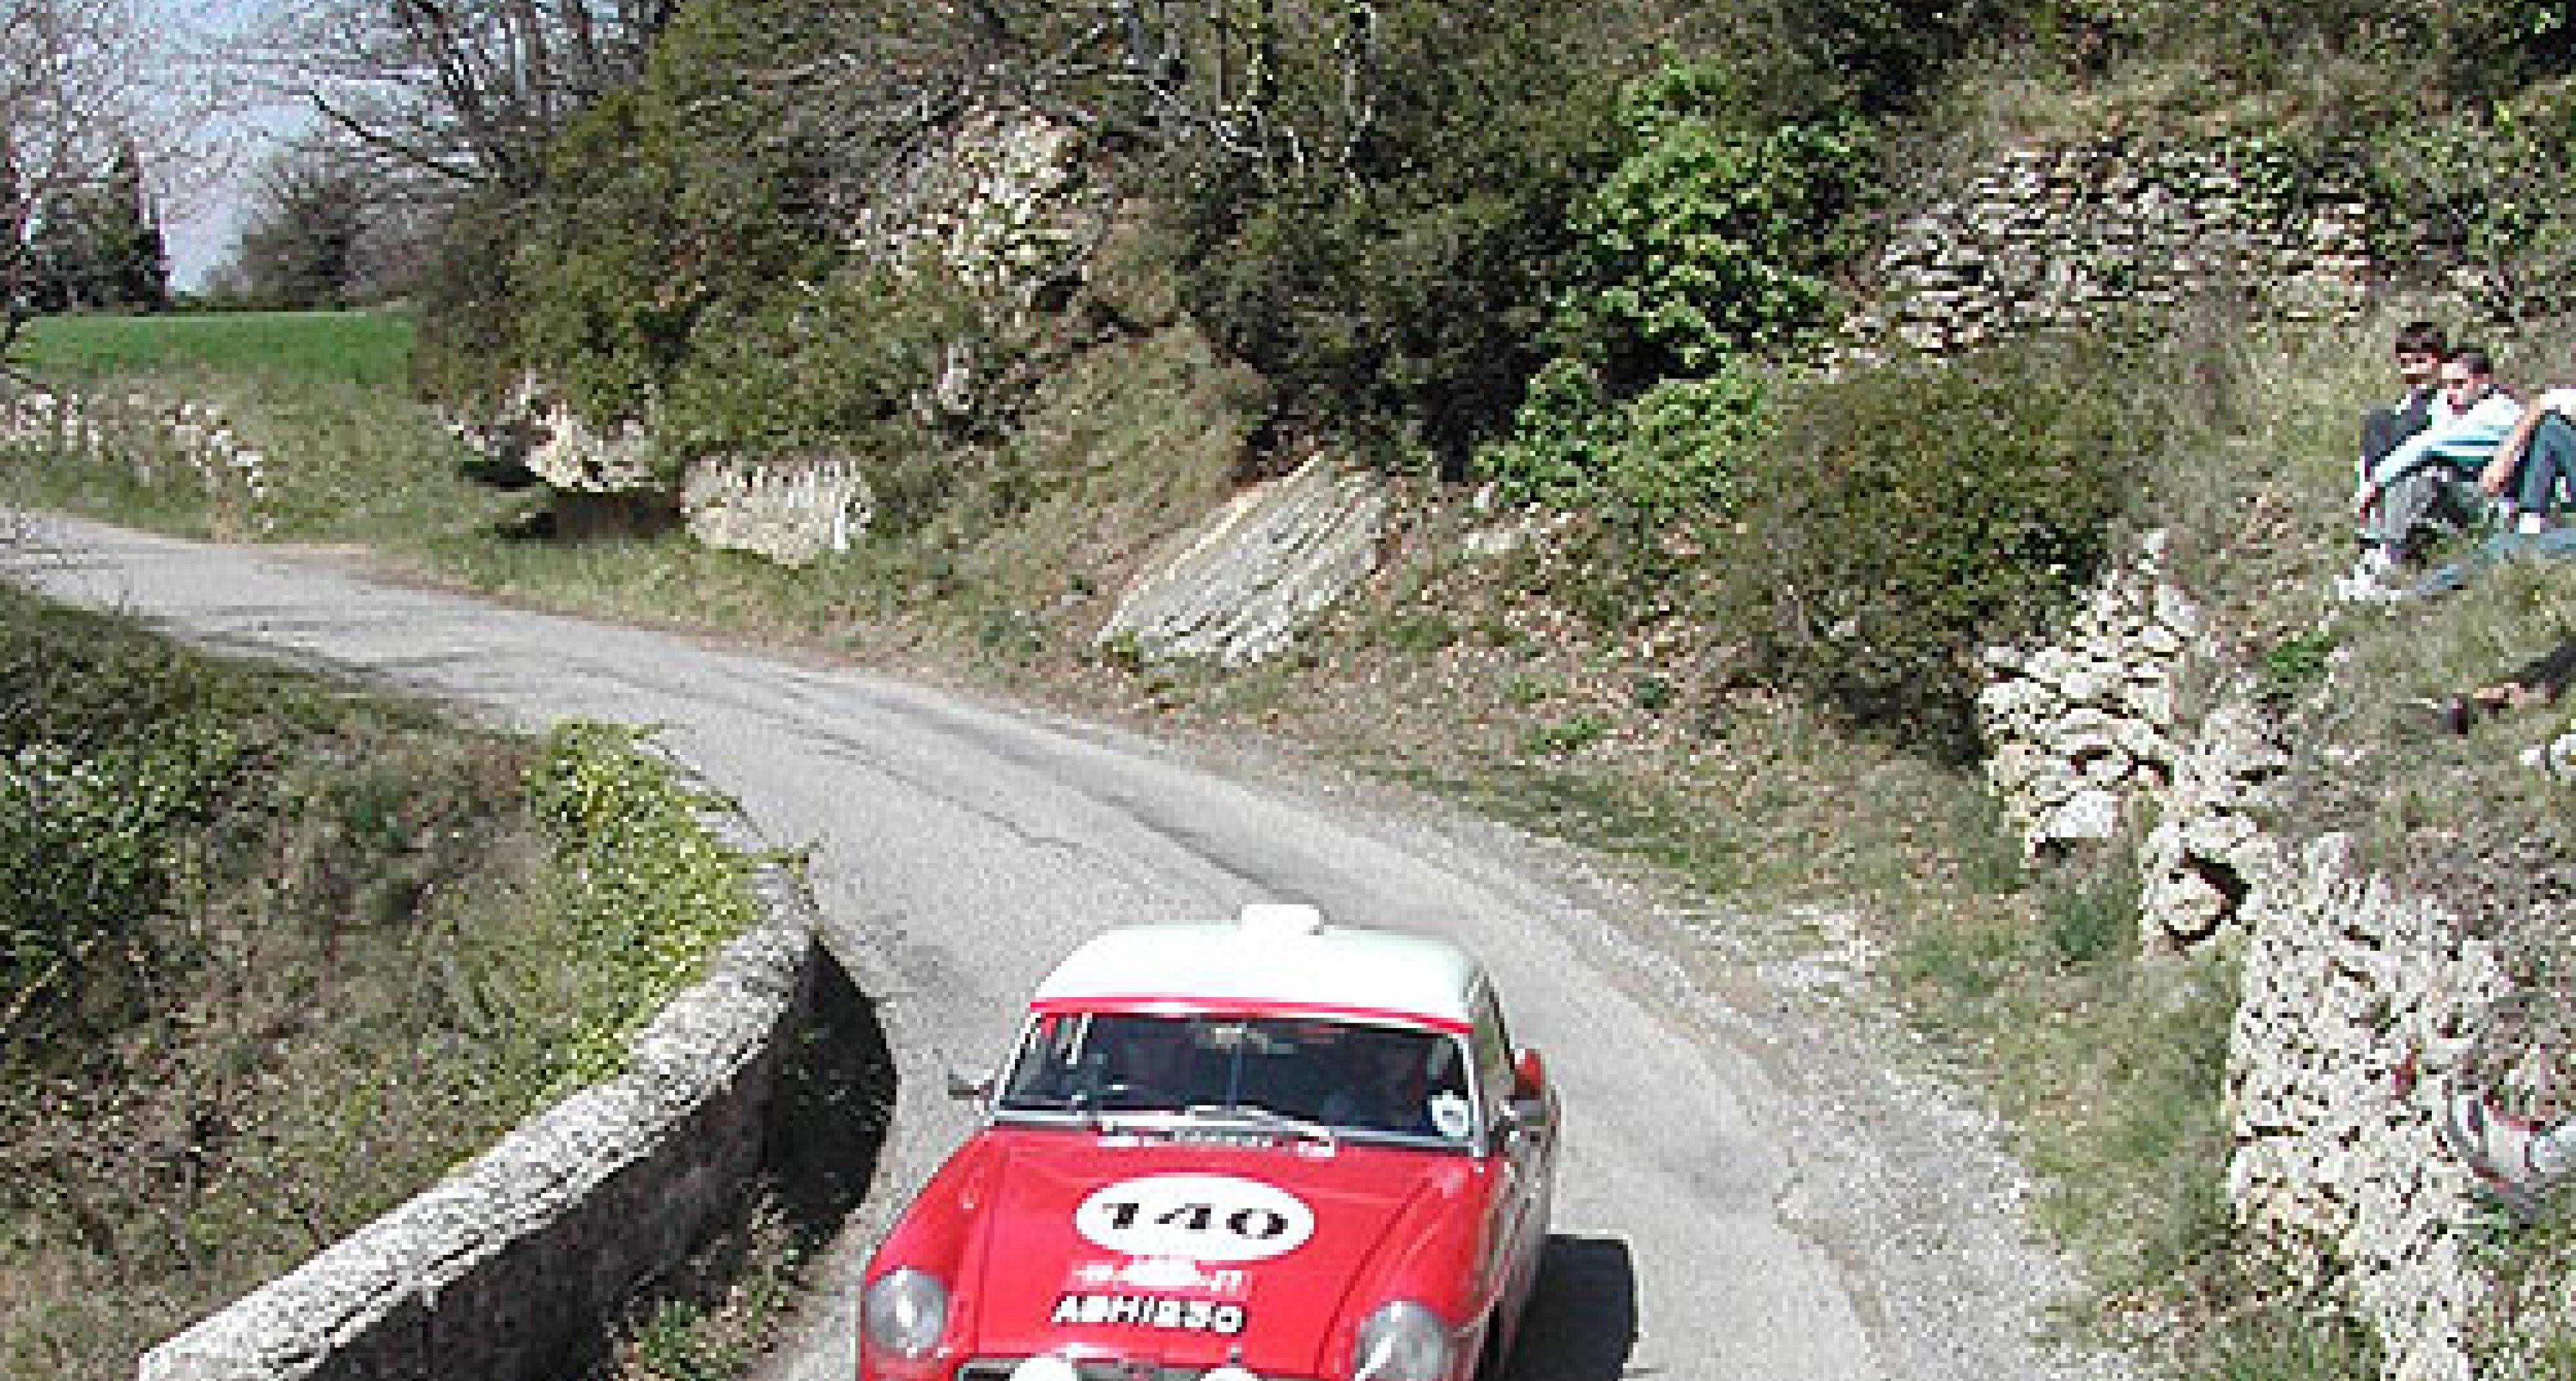 2003 Tour de France Auto summary - Day Six